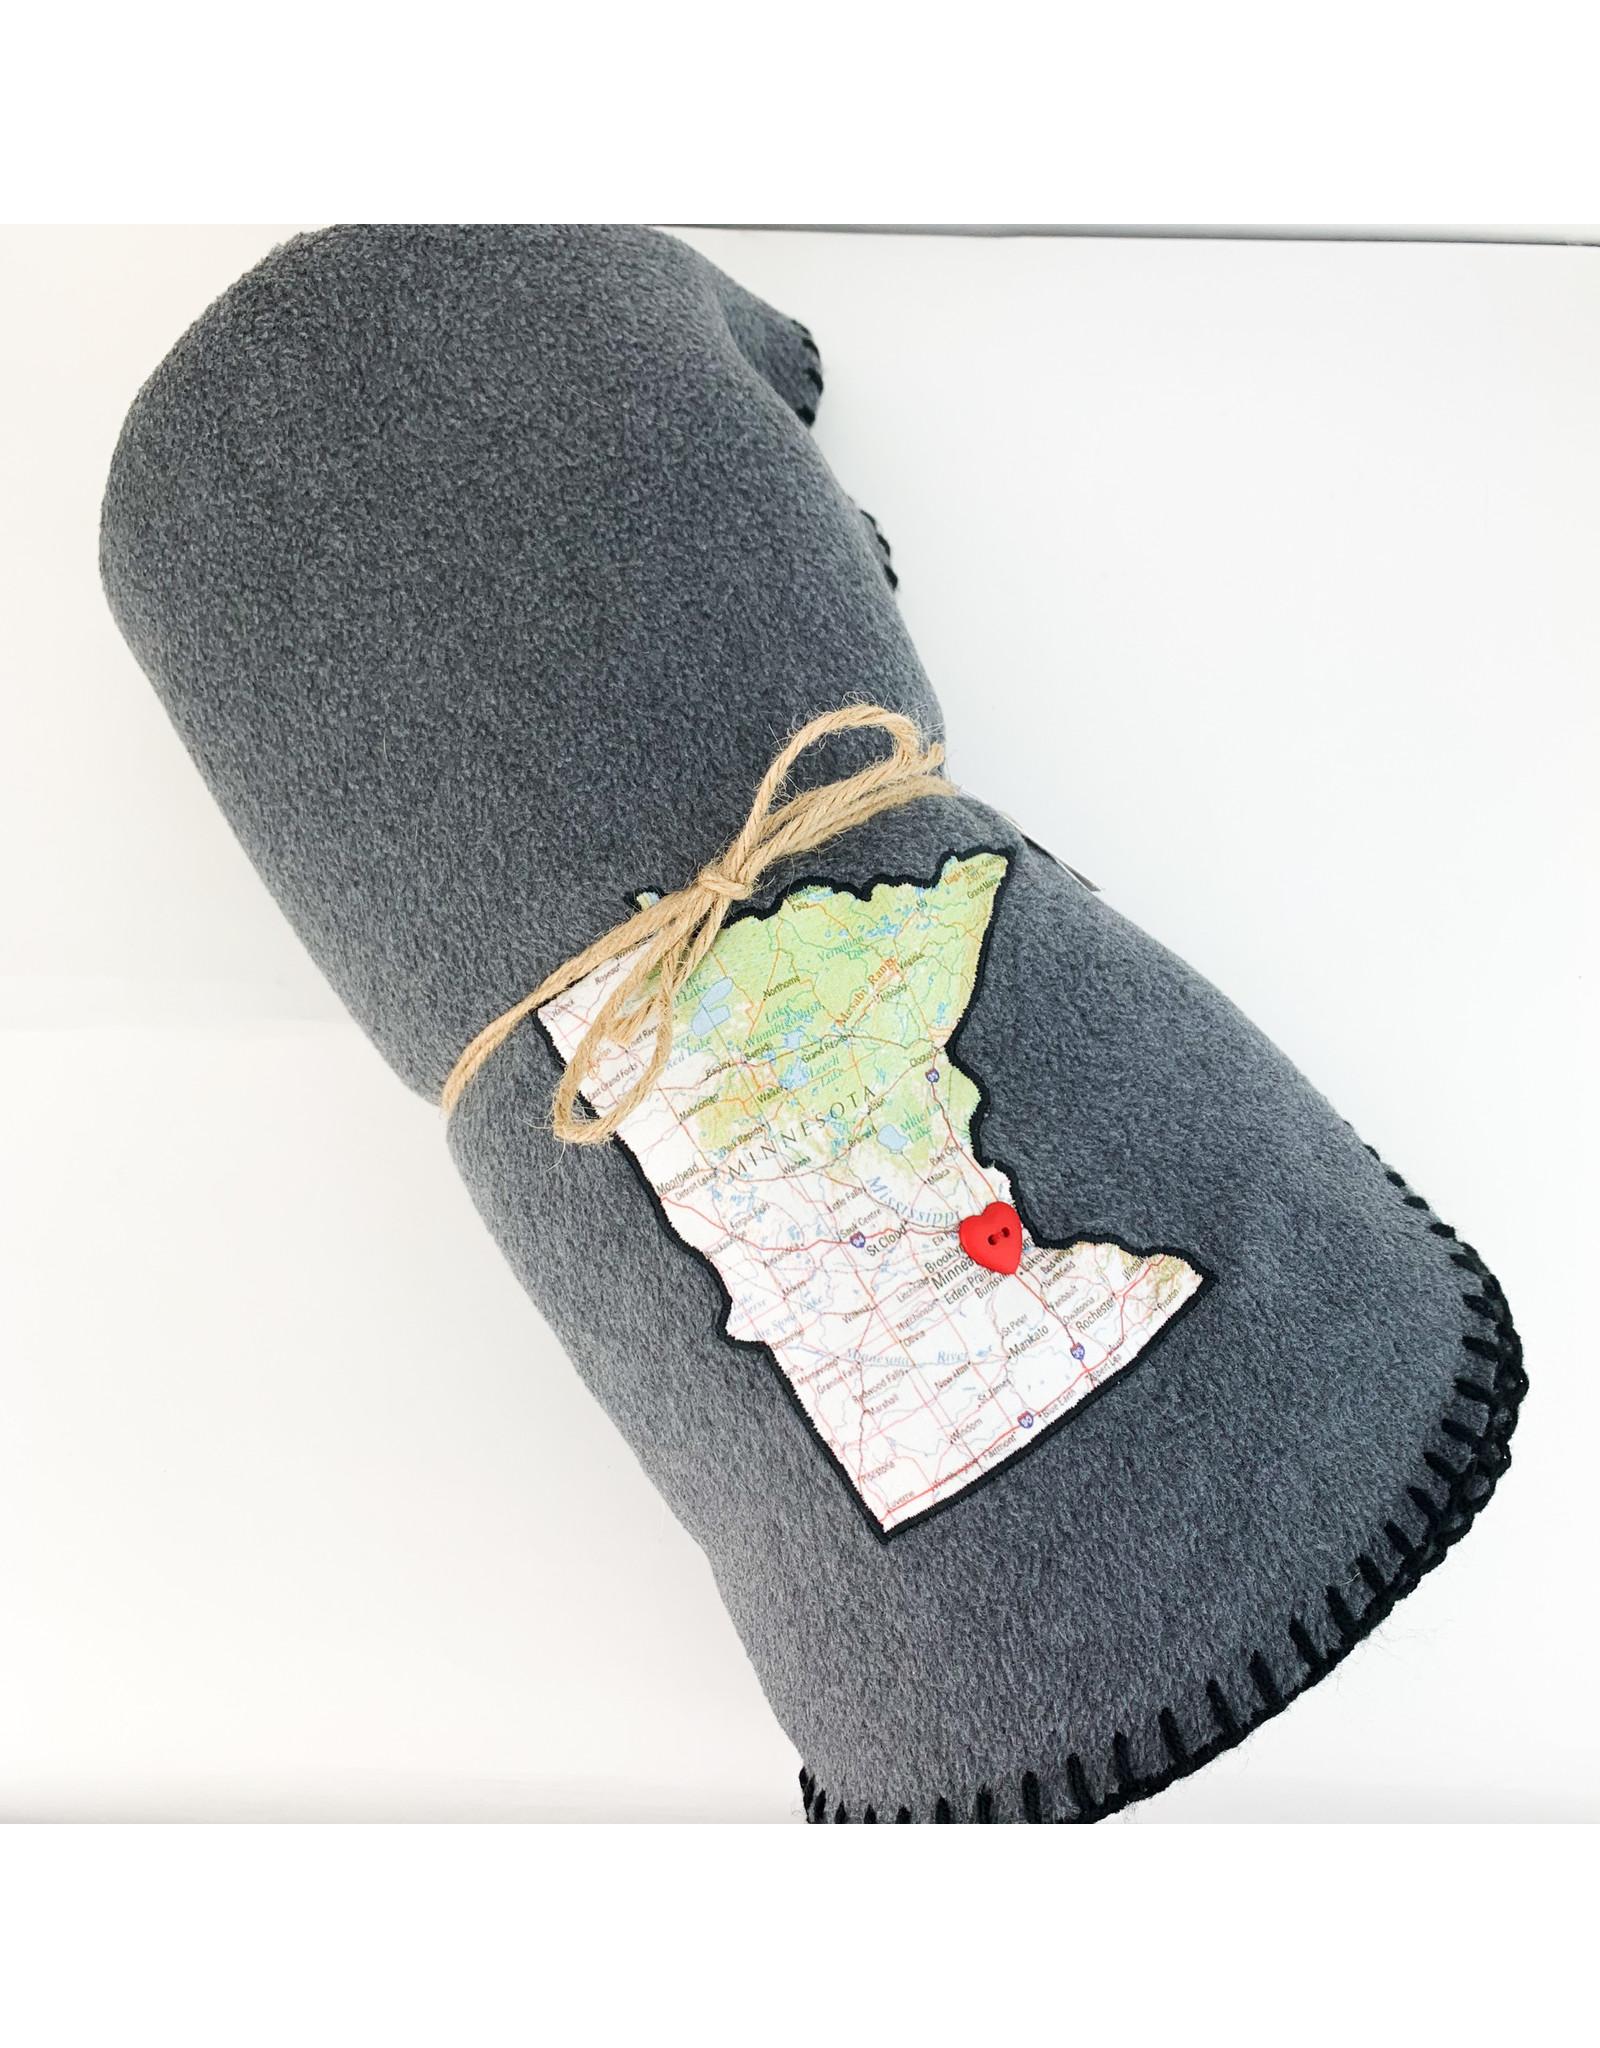 Taylor&Coultas American Mn. Map blanket